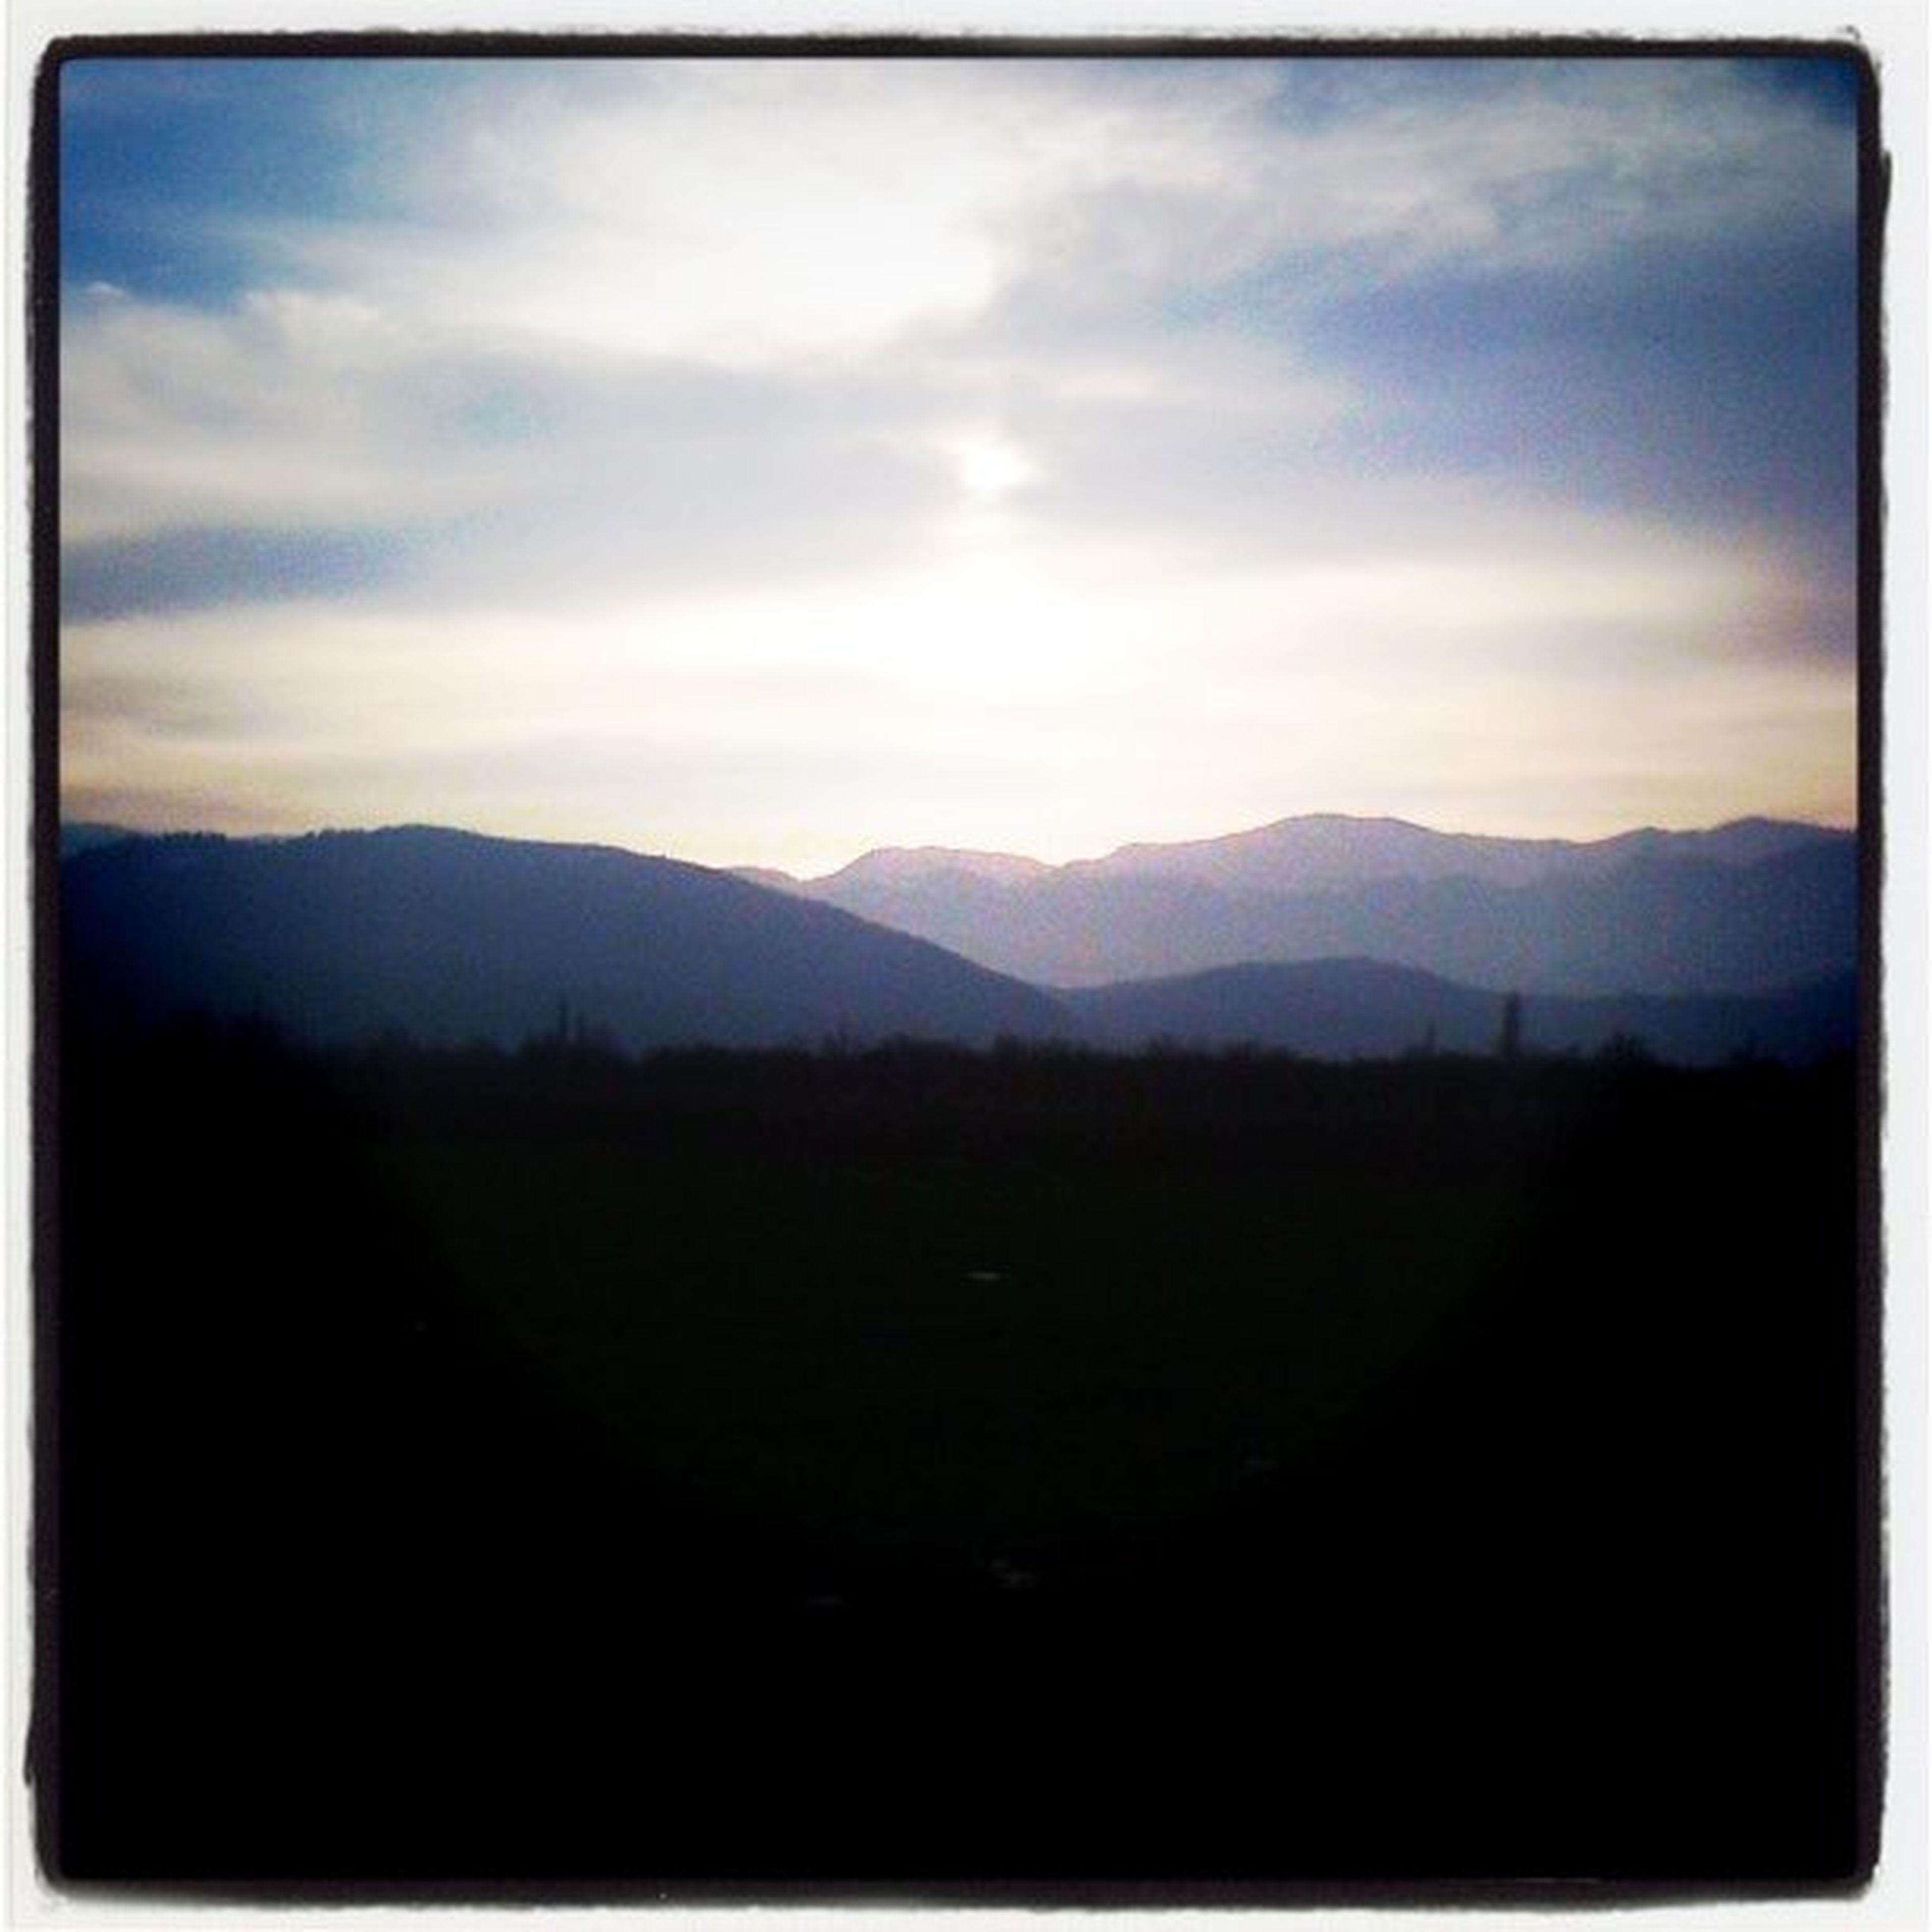 mountain, tranquil scene, mountain range, scenics, tranquility, landscape, sky, beauty in nature, silhouette, sunset, transfer print, nature, idyllic, cloud, cloud - sky, non-urban scene, dark, auto post production filter, horizon over land, non urban scene